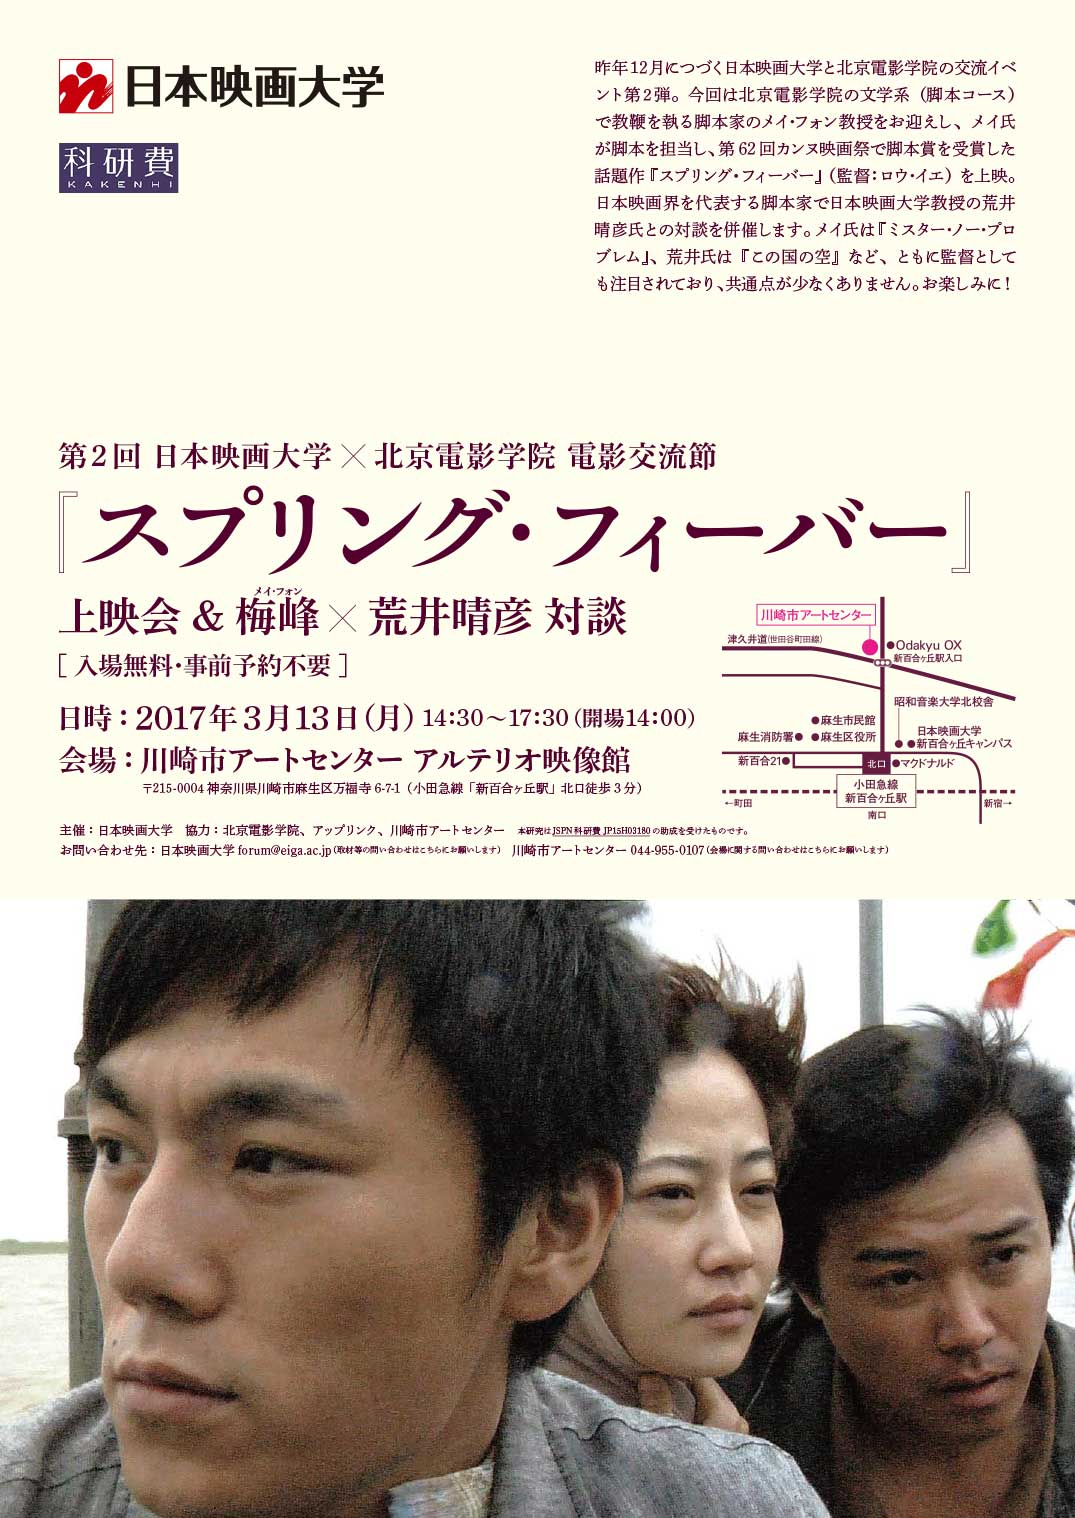 170313_denei_chirashi-1.jpg